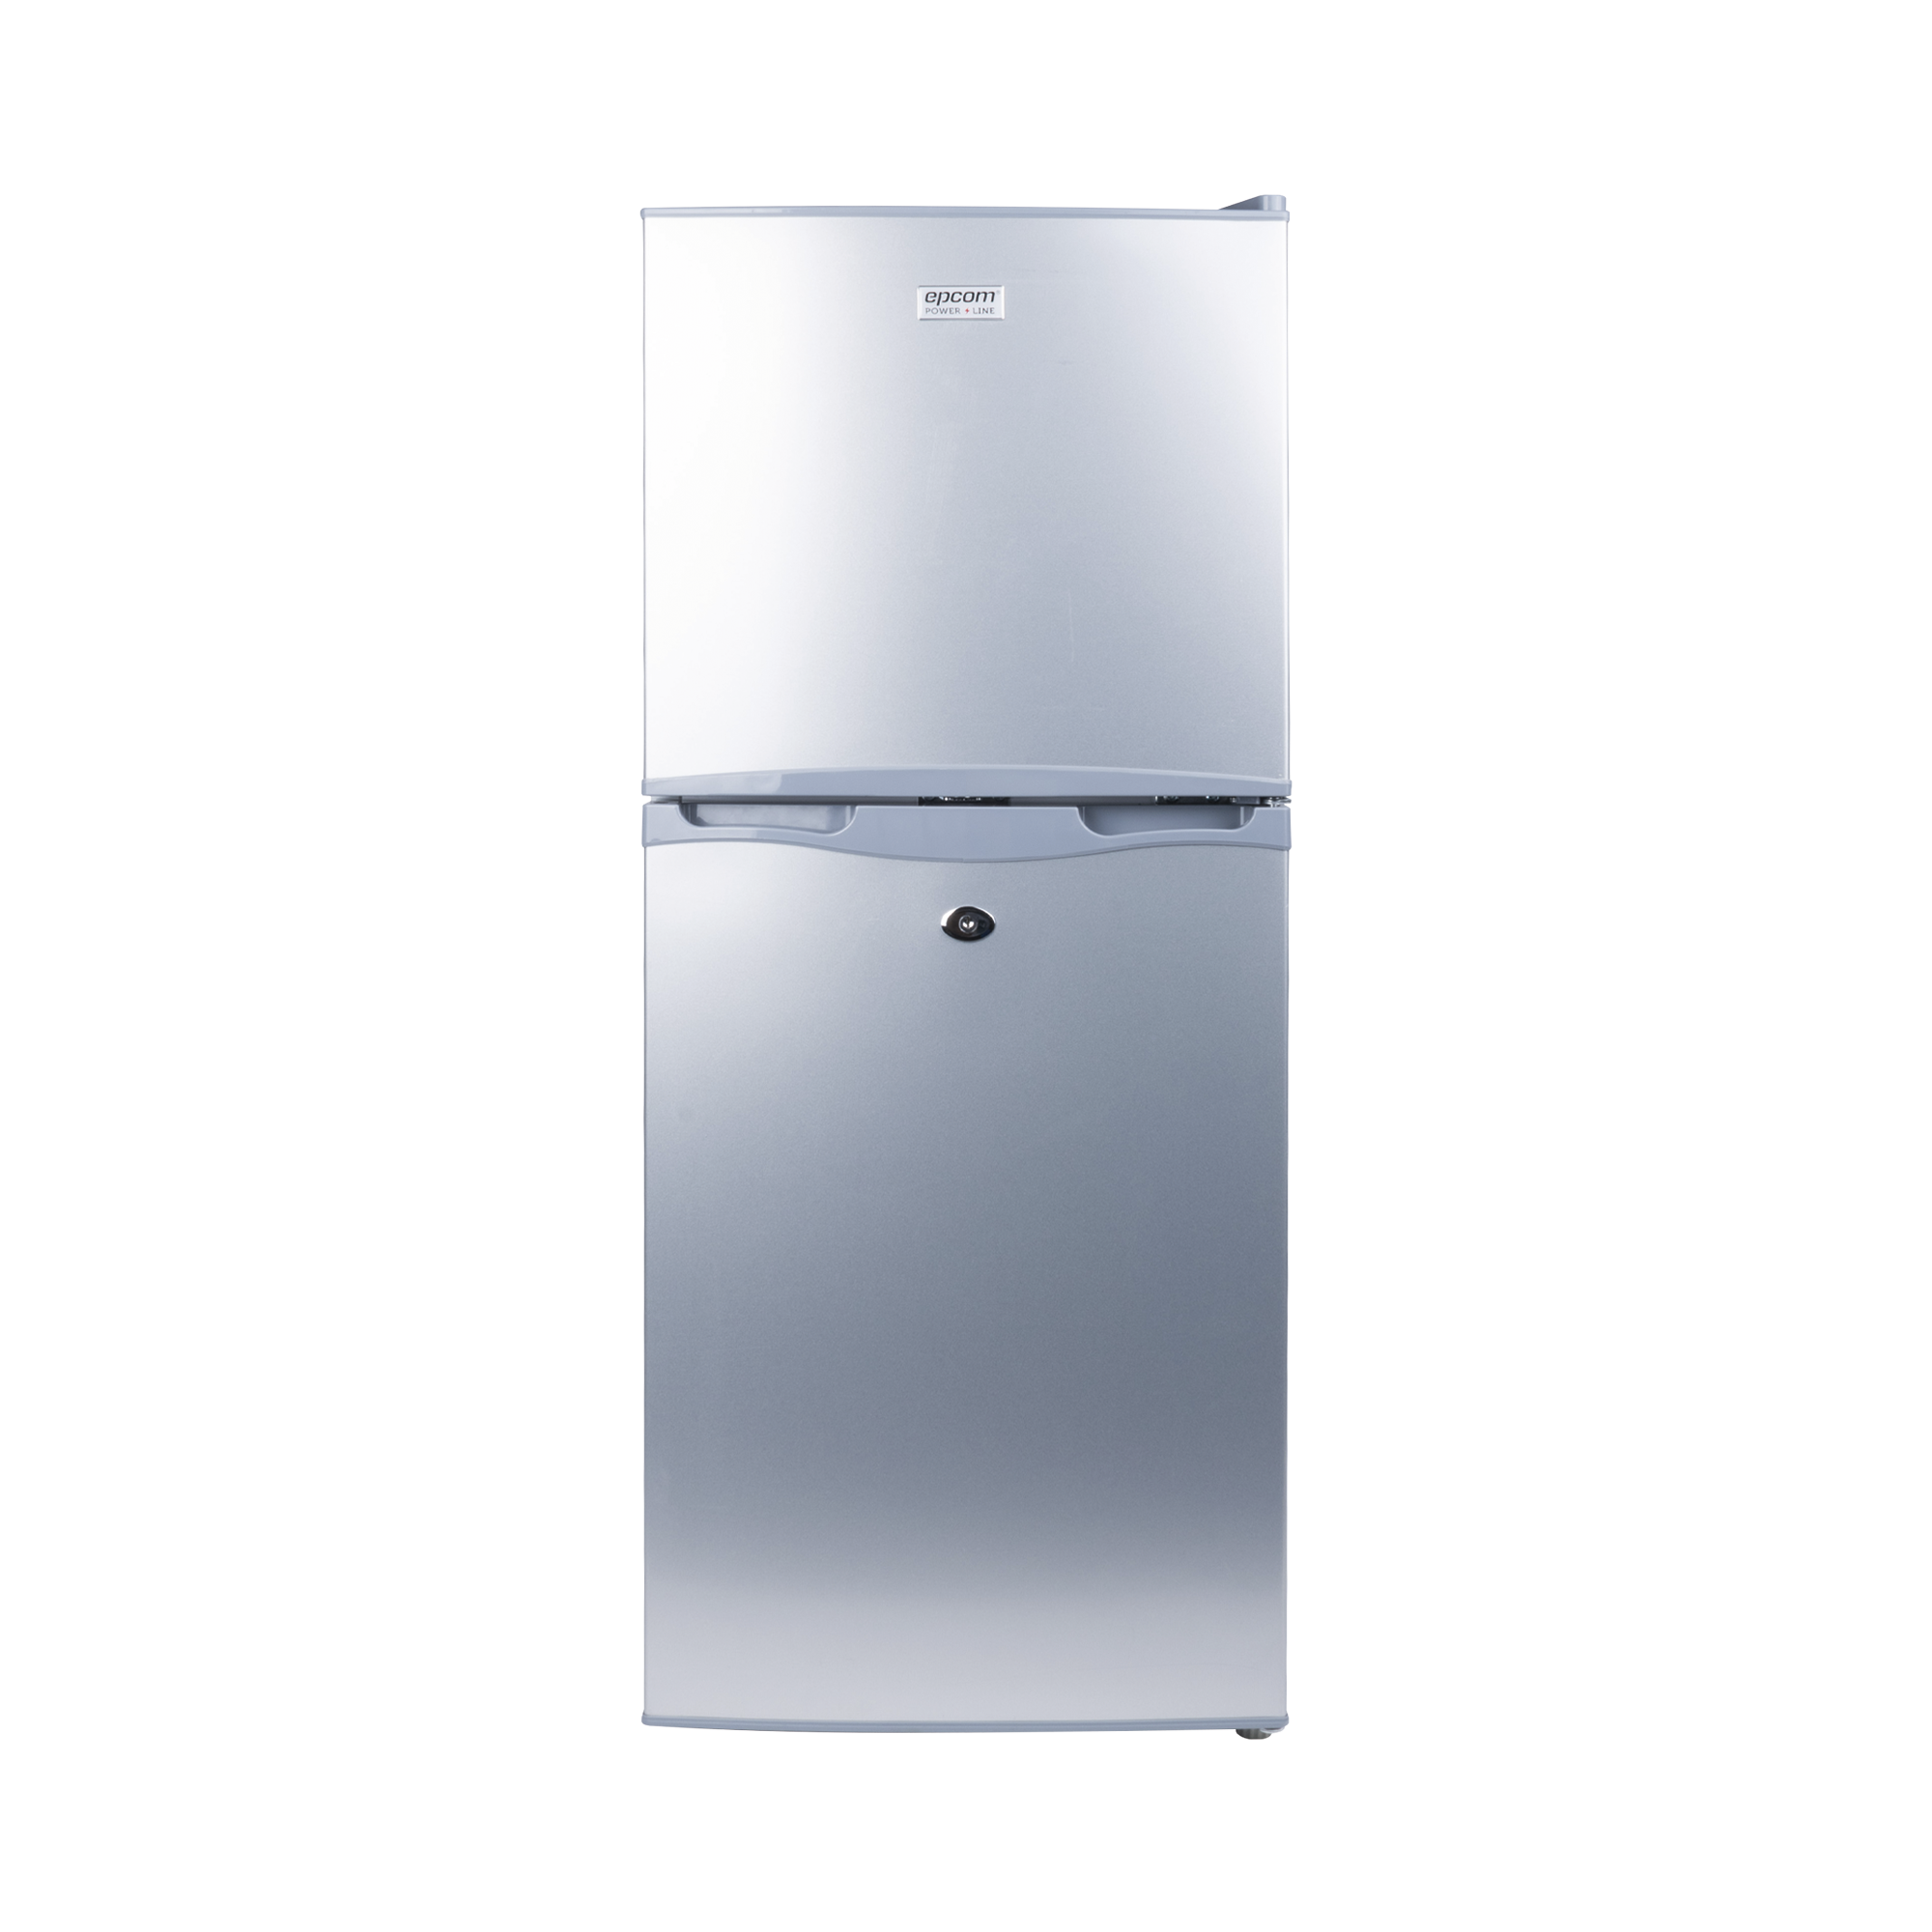 Refrigerador combinado para aplicaciones fotovoltaicas aisladas de la red 105 L